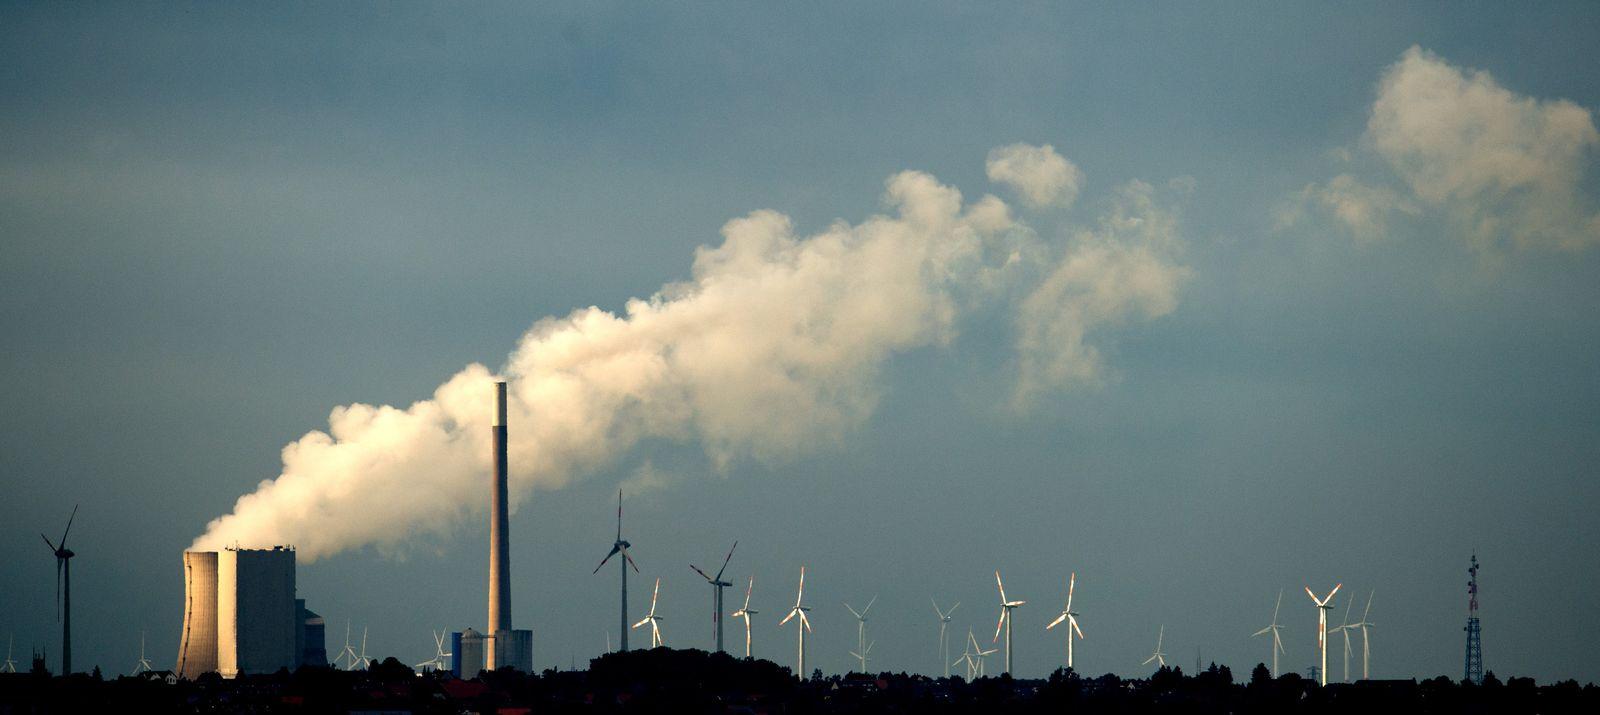 Kraftwerk Mehrum / Steinkohlekraftwerk / Windenergie